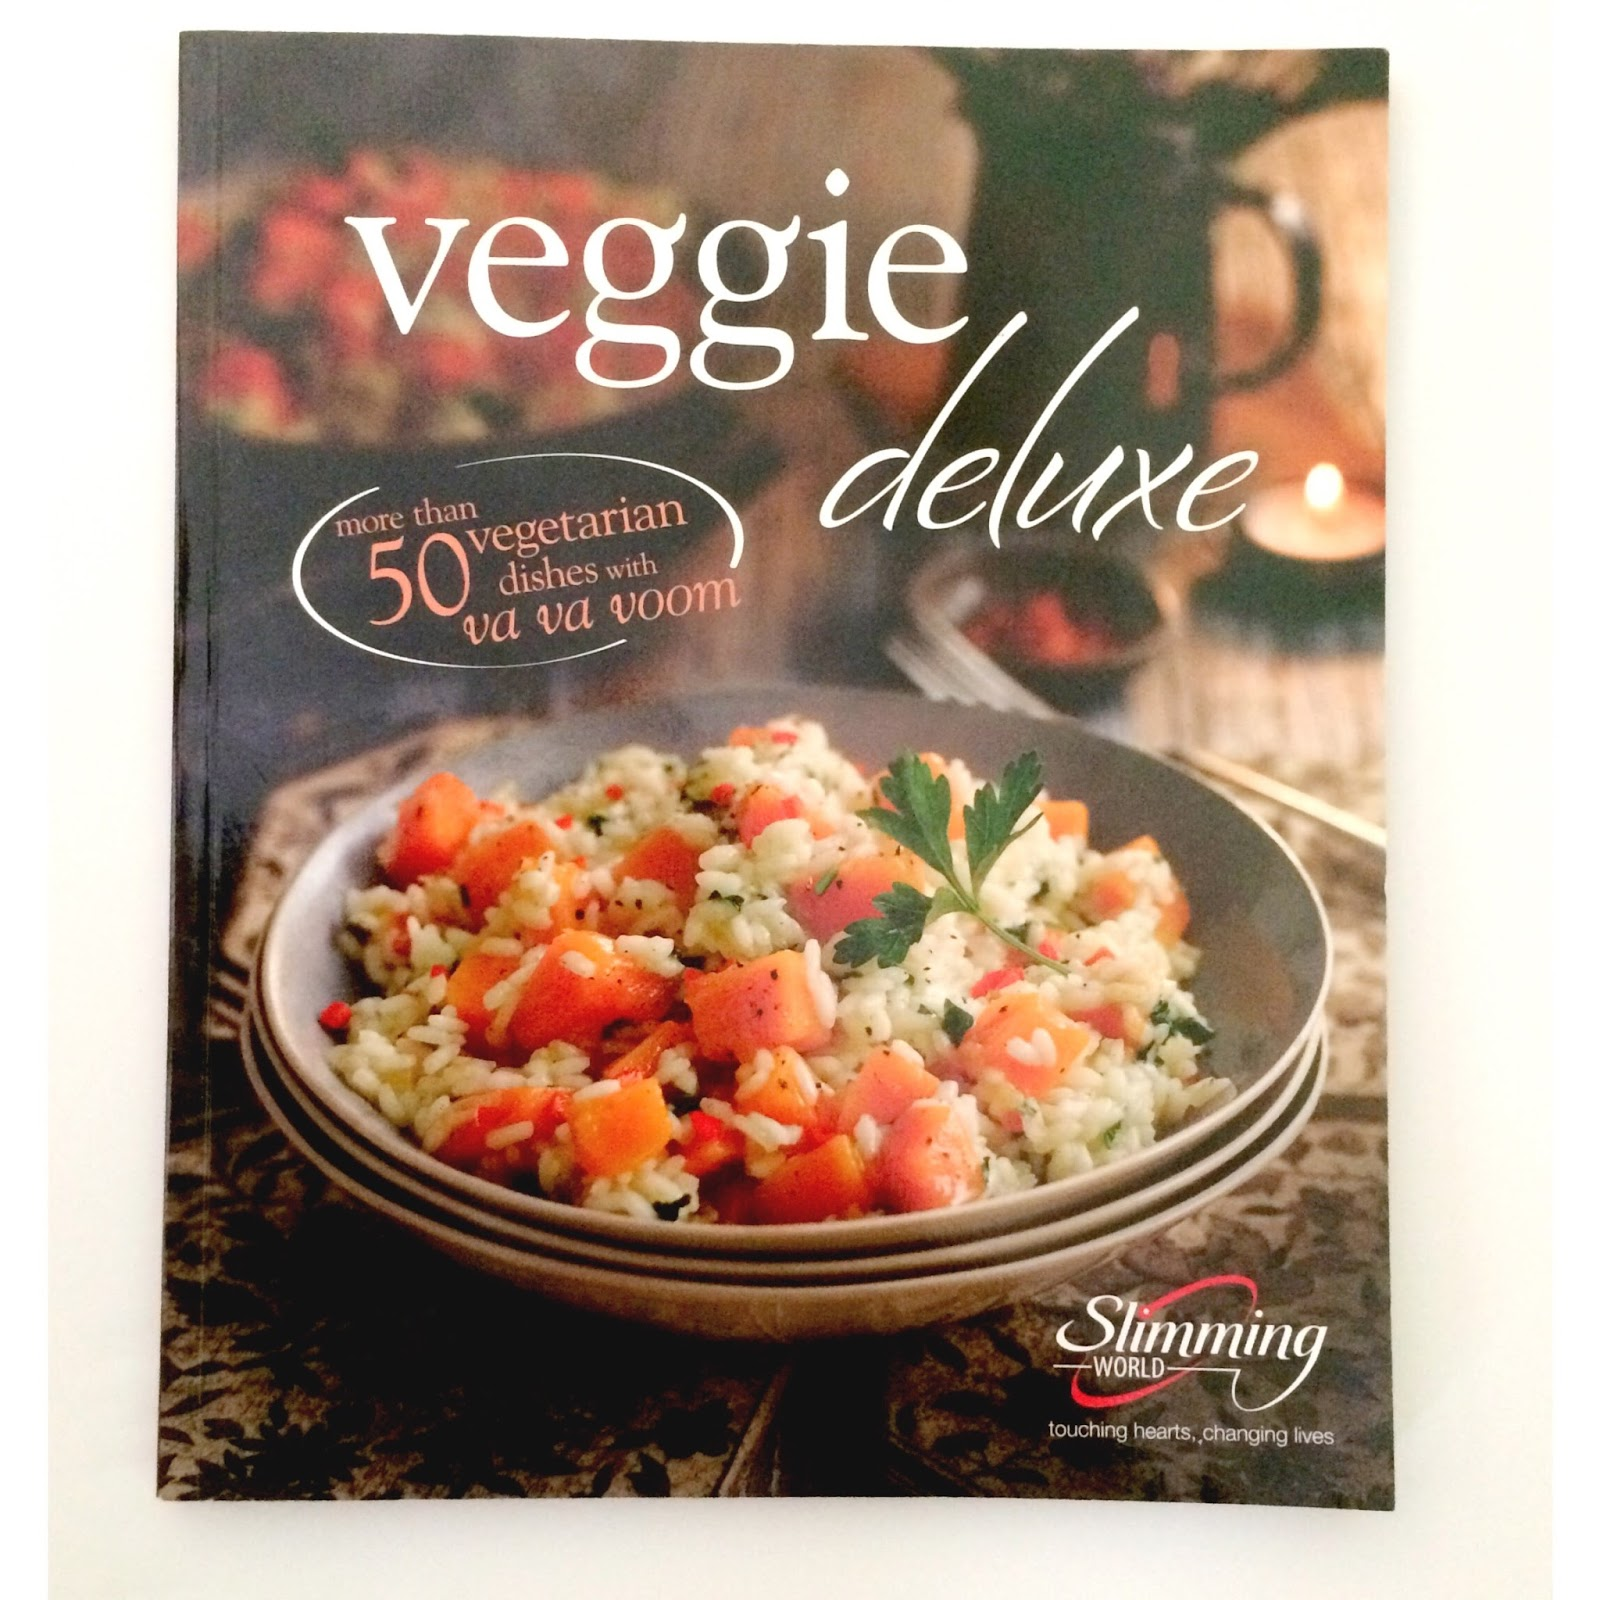 Slimming world veggie deluxe recipe book review newcastle family life slimming world veggie recipe book forumfinder Choice Image